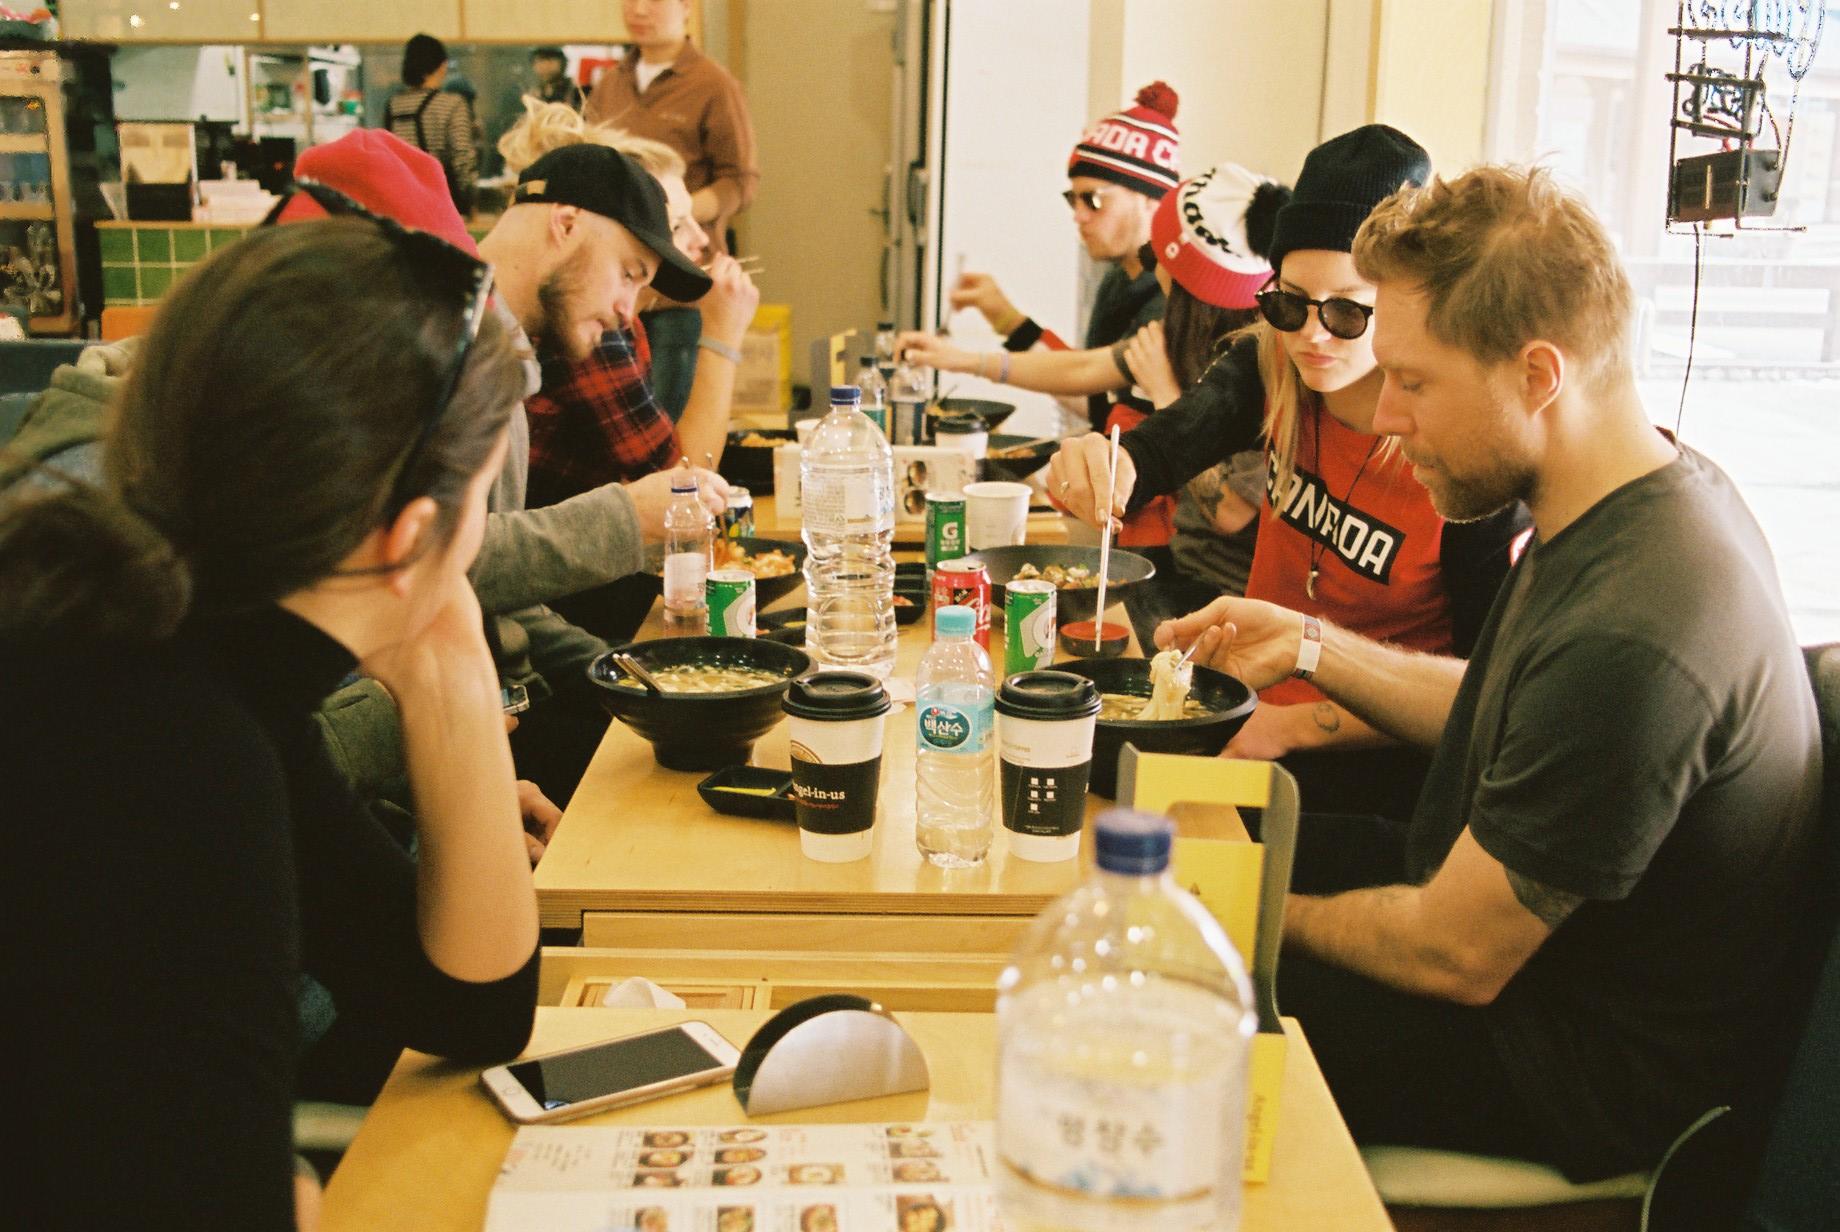 breakfast lunch hungover korea 2018.jpeg